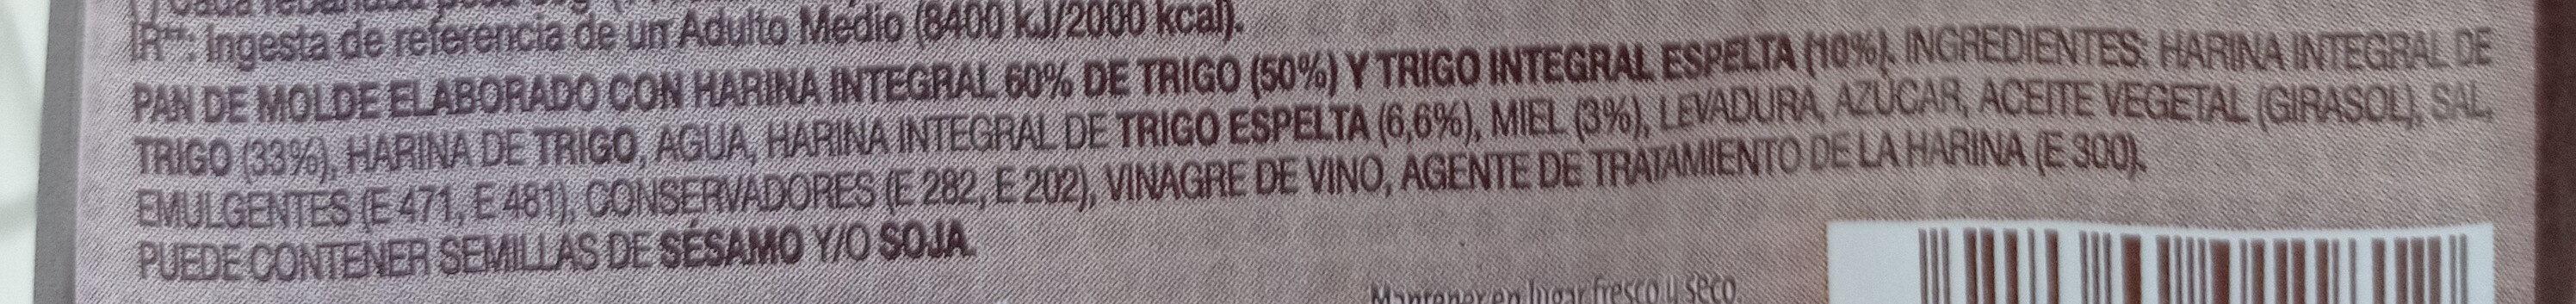 Rebanada Estilo Artesano - Ingredientes - fr